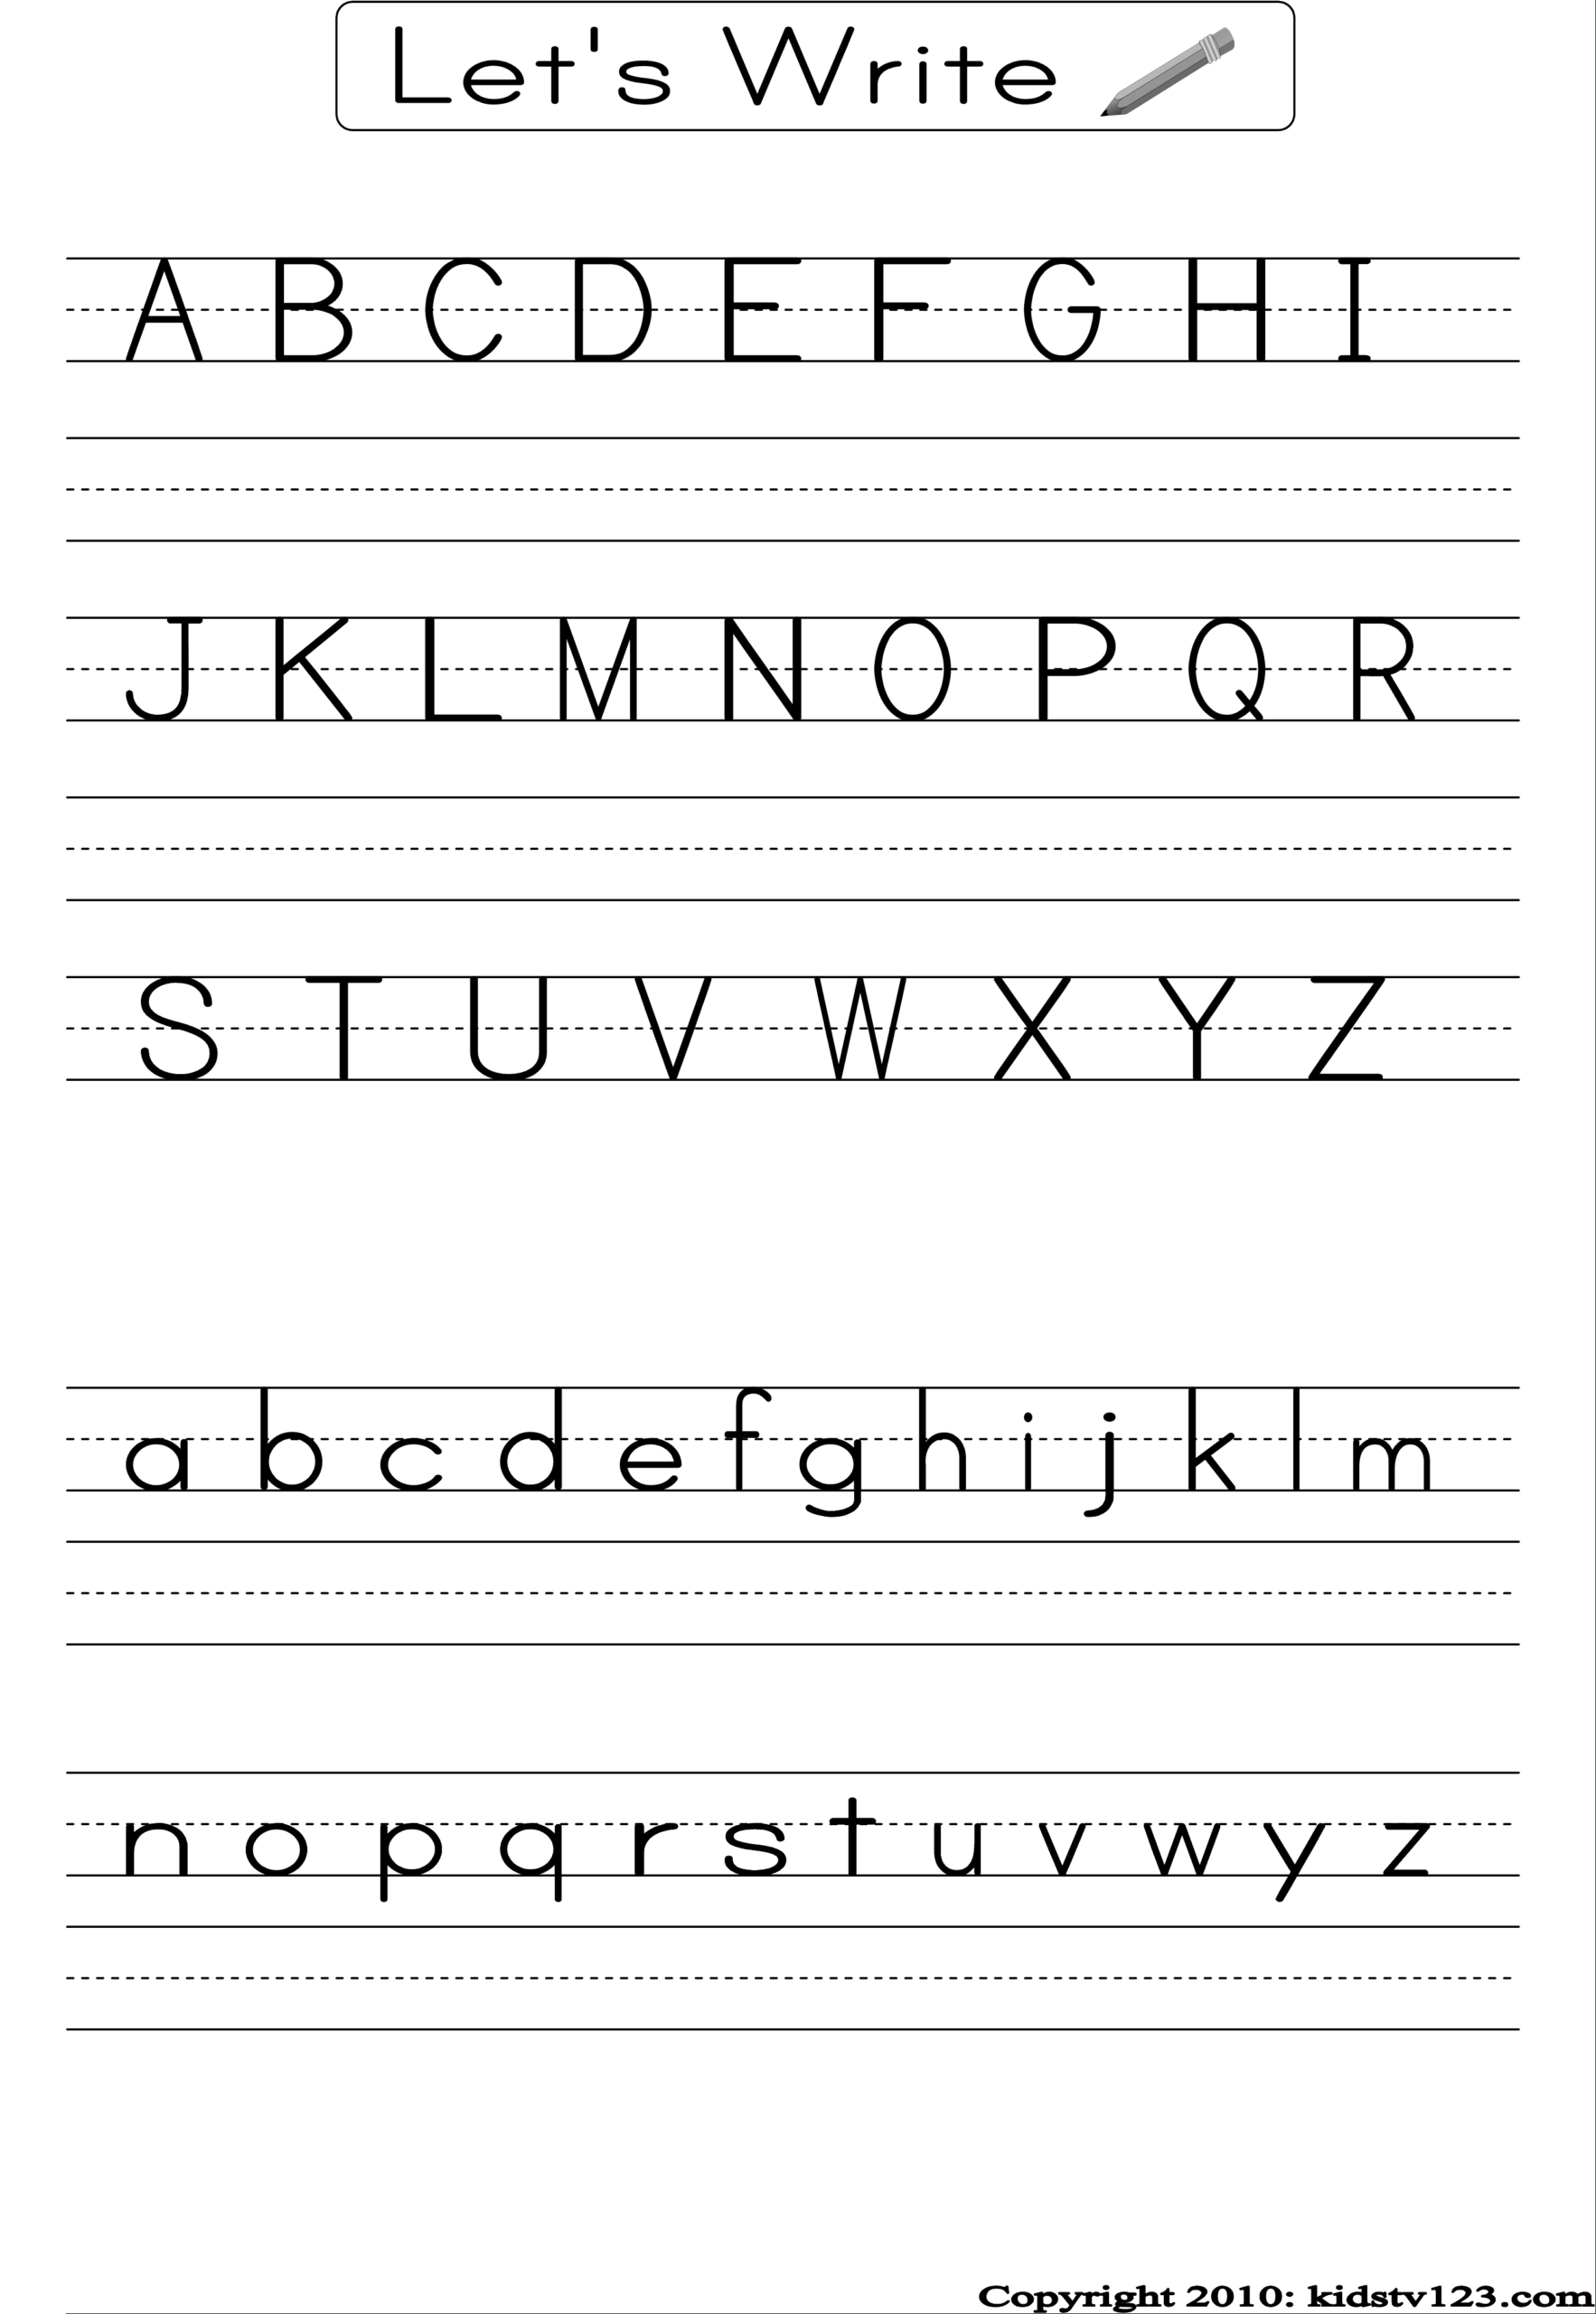 Alphabet Writing Practice Sheet | Alphabet Writing Practice with Alphabet Worksheets With Pictures